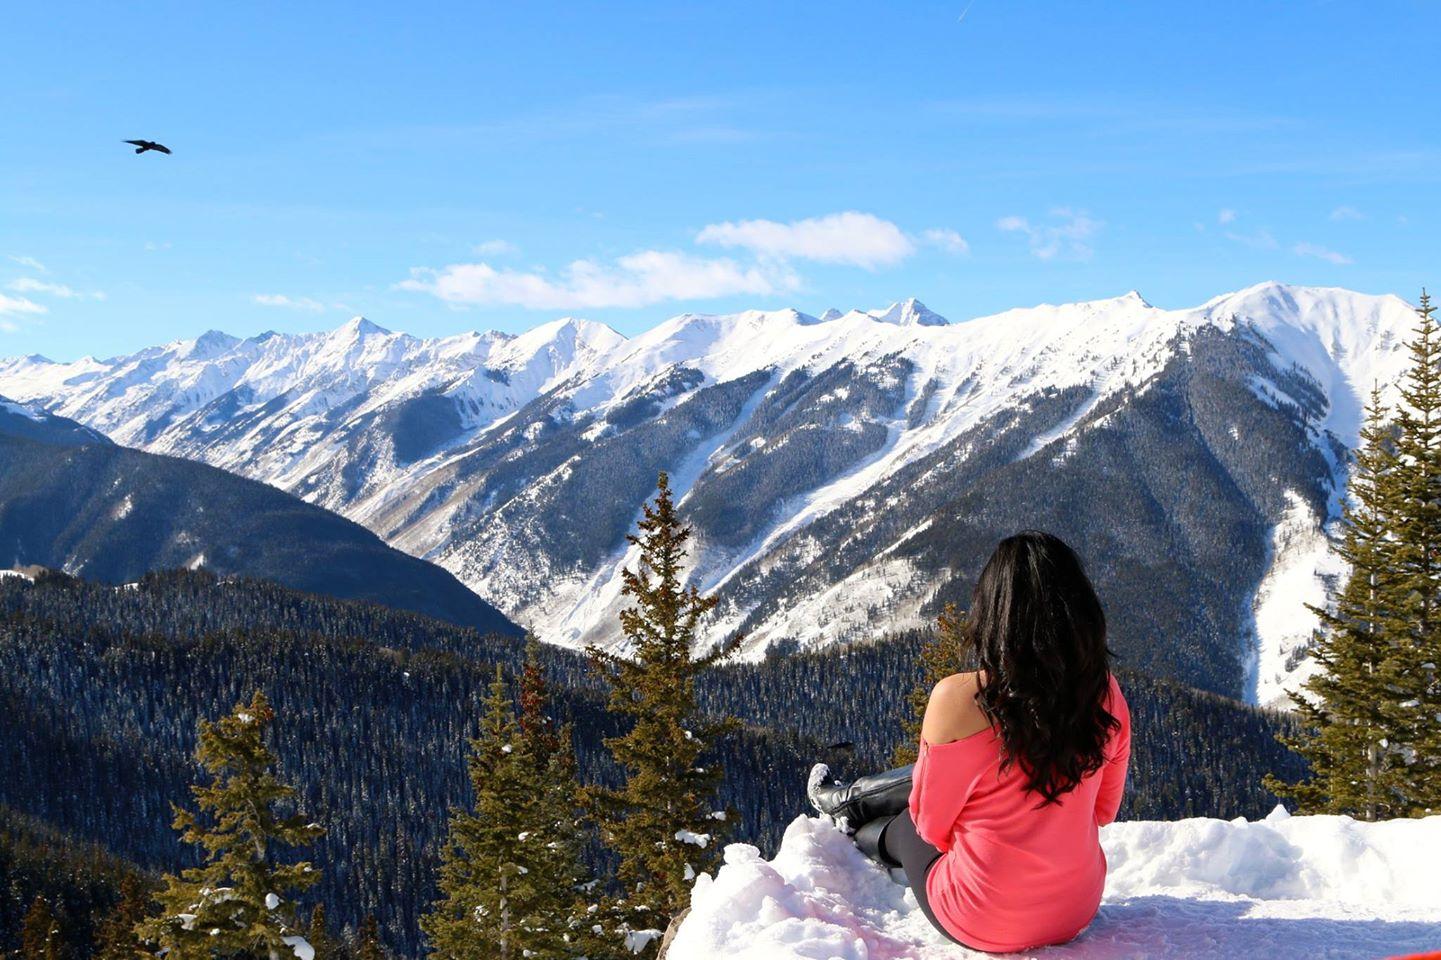 Aspen, Colorado, USA @StephBeTravel @TravelBreak by @MichaelHodson